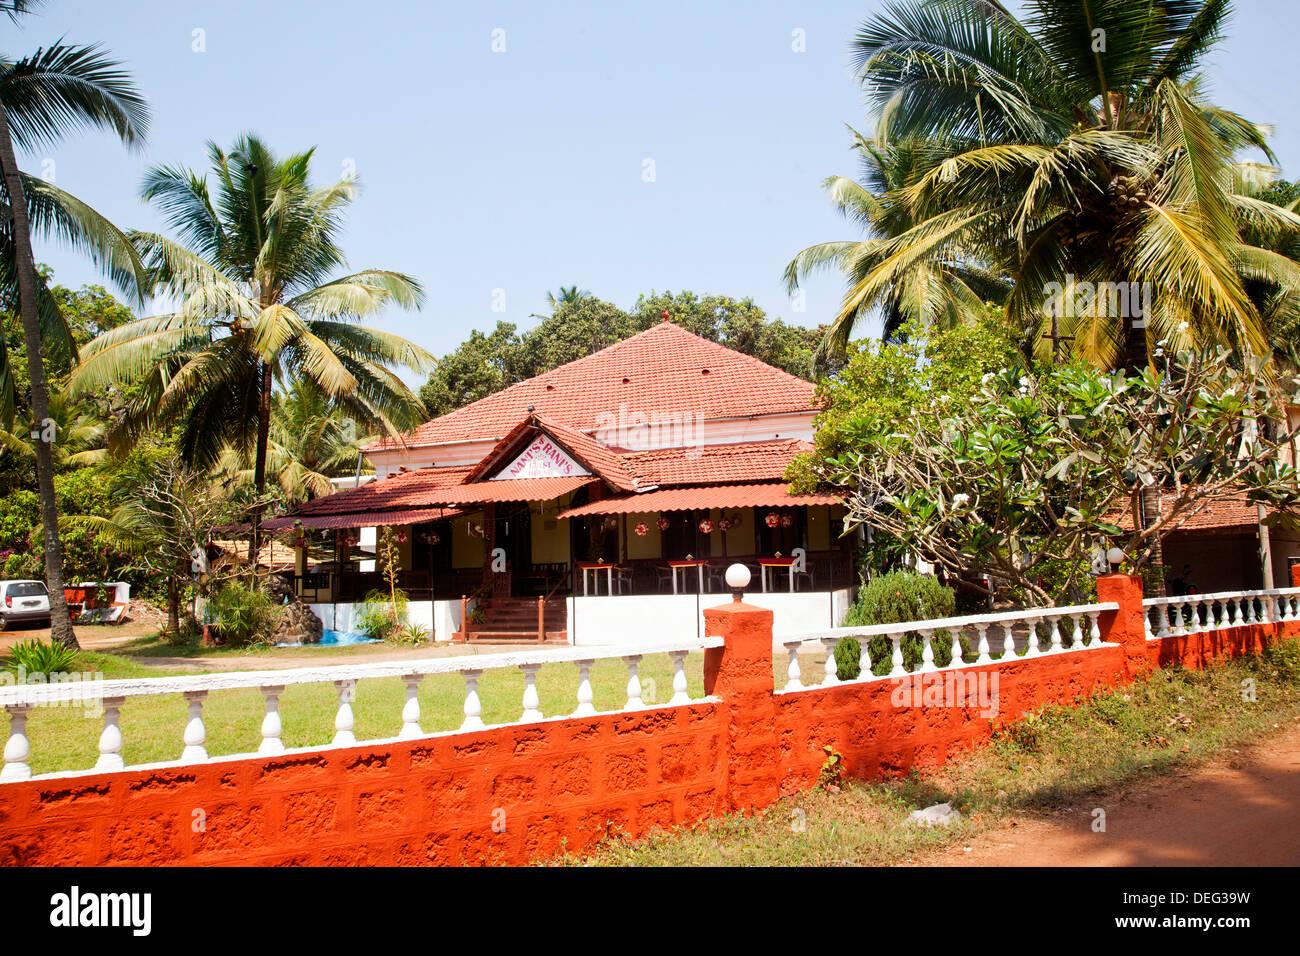 Building surrounded by palm trees, Patrick Spiritual Healer, Nani's Rani's, Baga, Bardez, North Goa, Goa, India - Stock Image